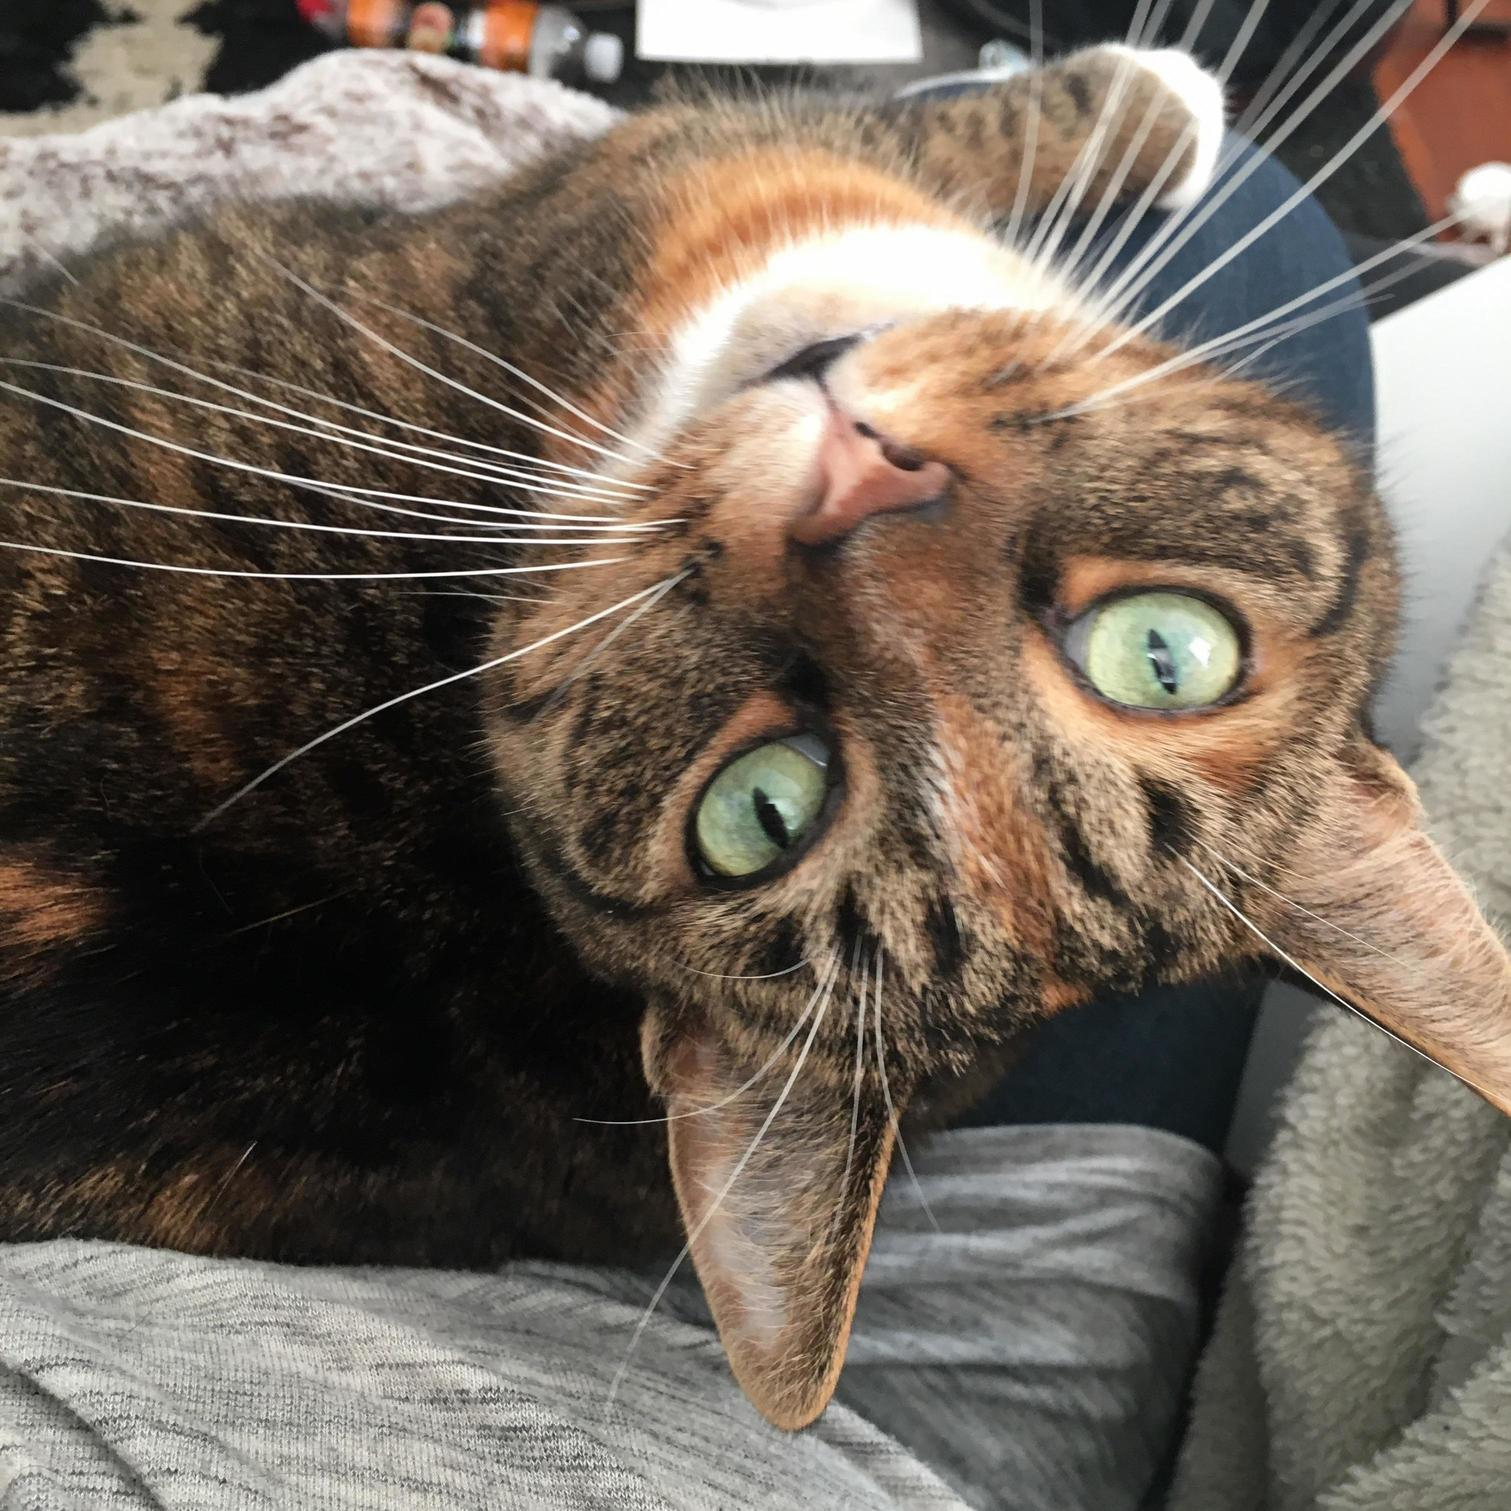 Chloe prefers to look at me upside down.